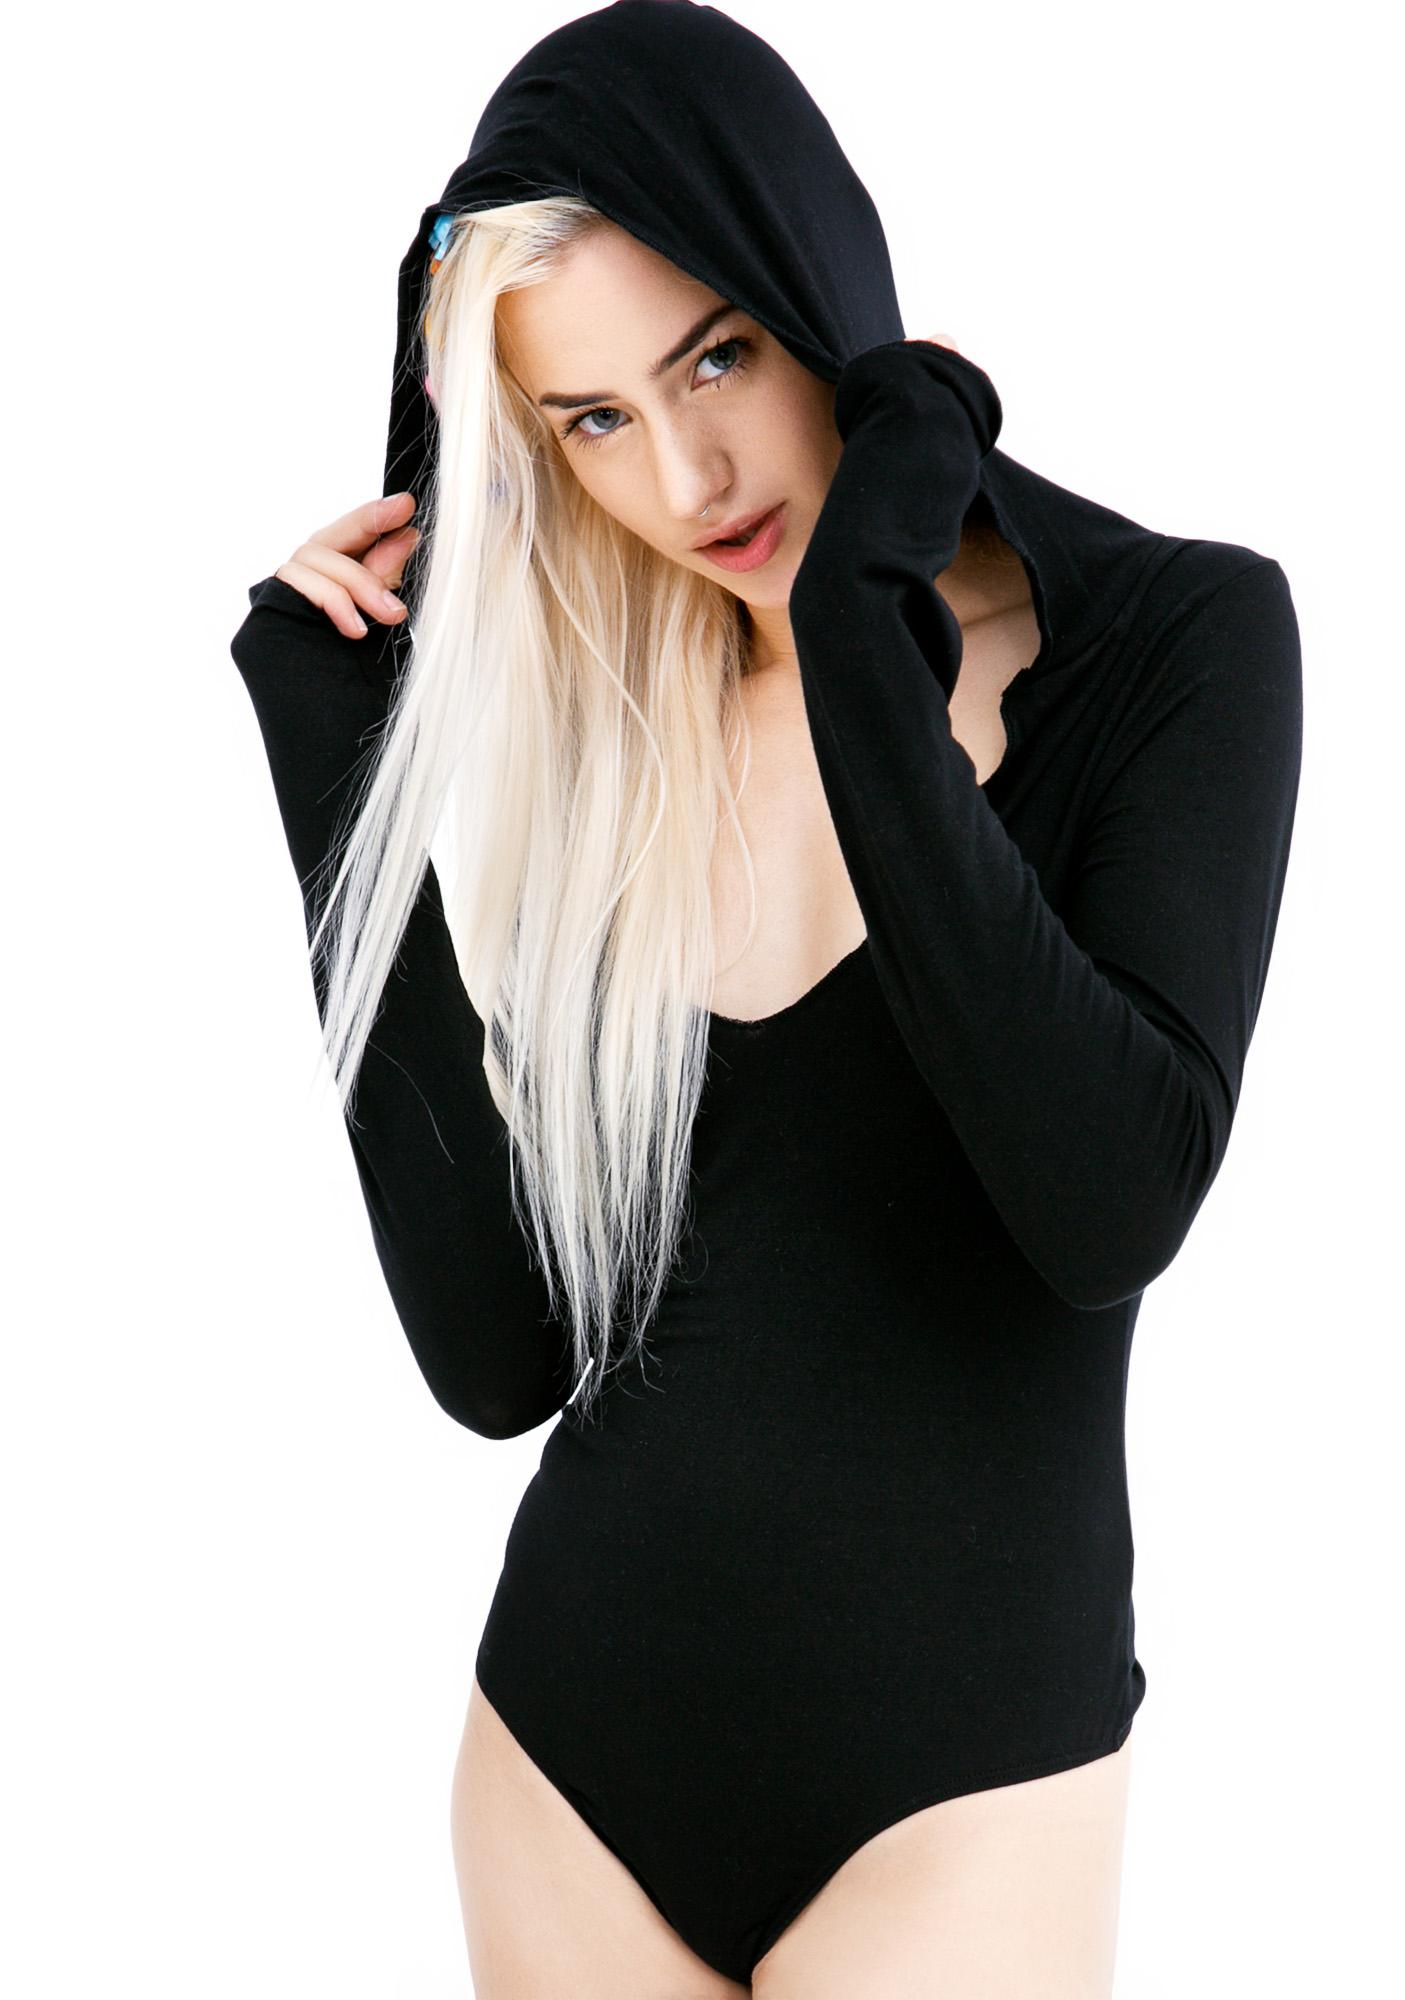 Olympia Theodora Hooded Bodysuit